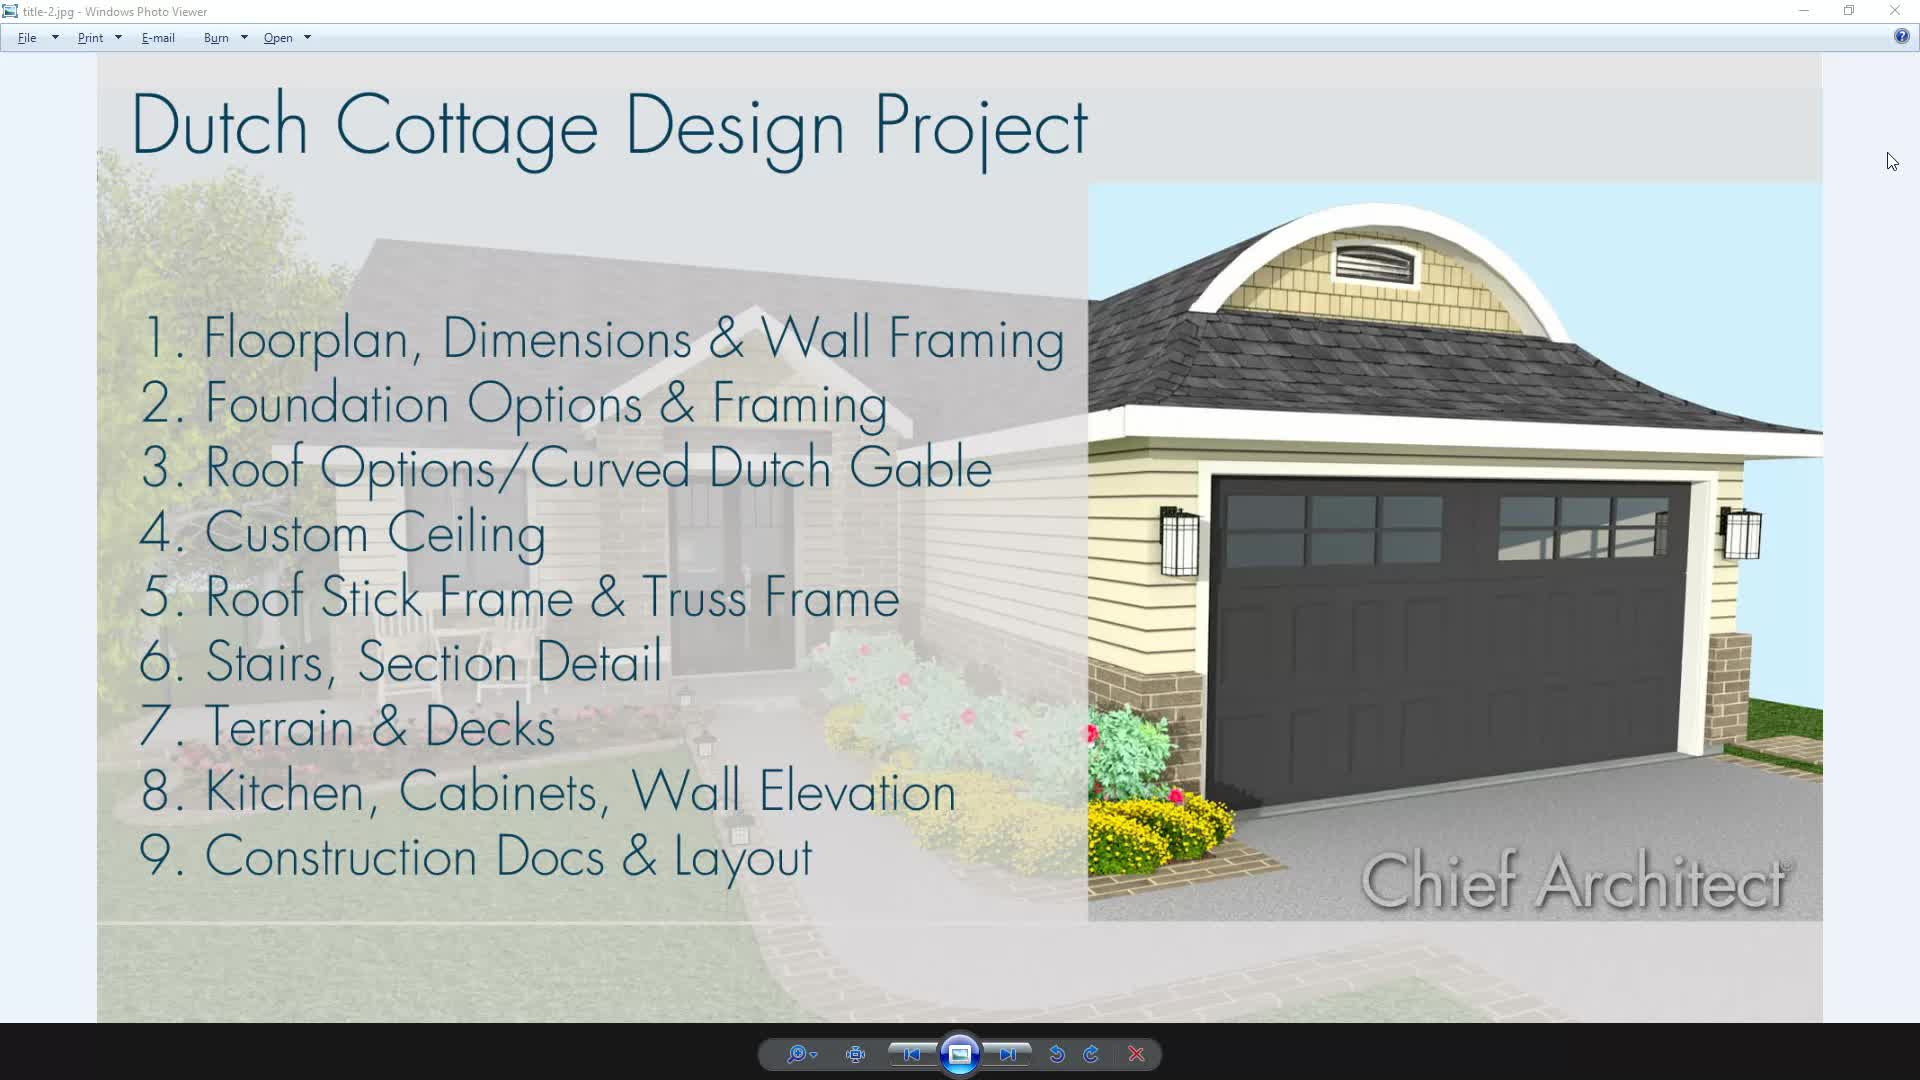 Custom Vaulted Ceiling - Dutch Cottage Design